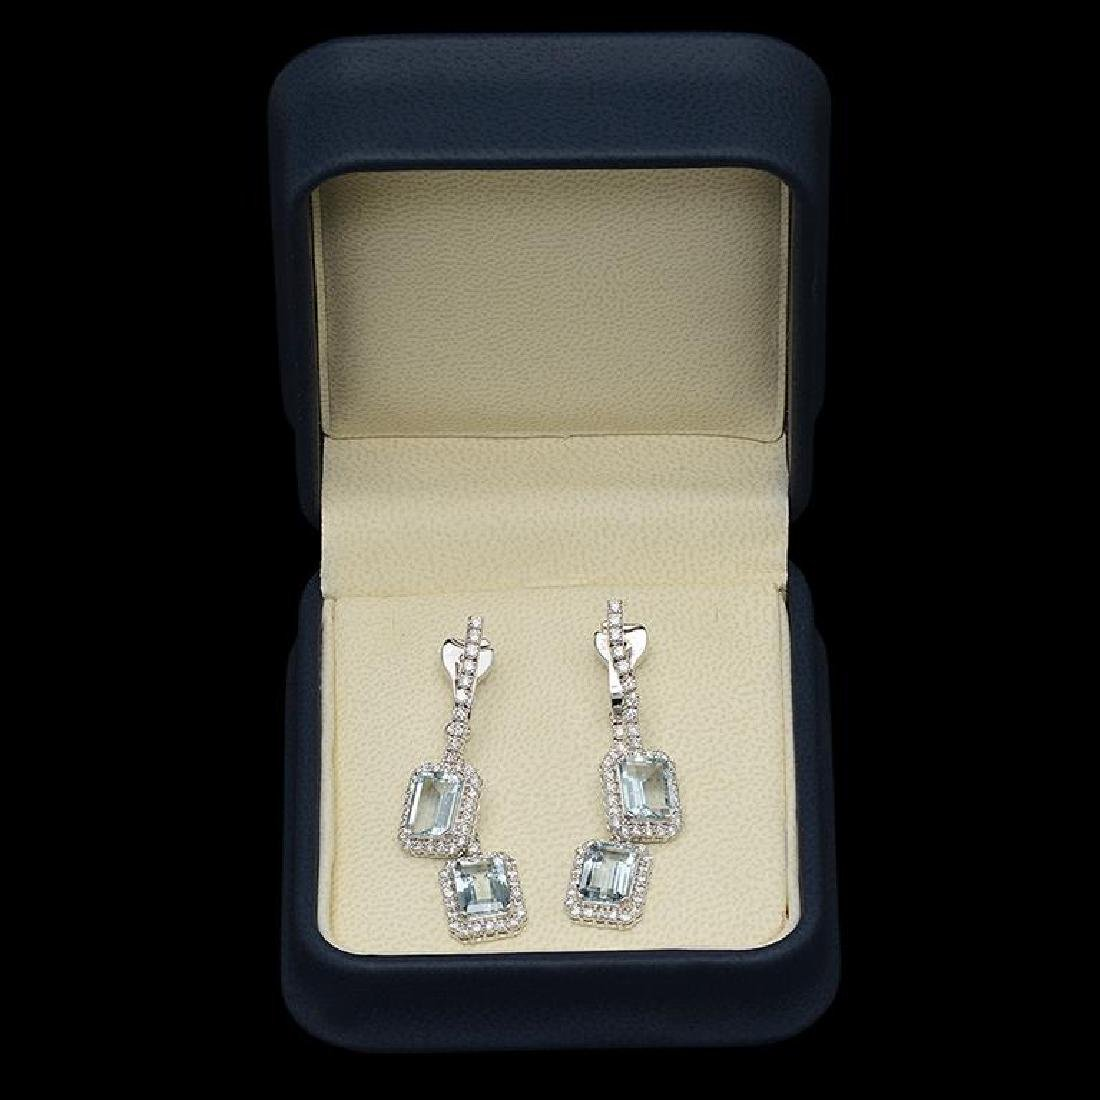 14k Gold 6.70ct Aquamarine & 2.15ct  Diamond Earrings - 2